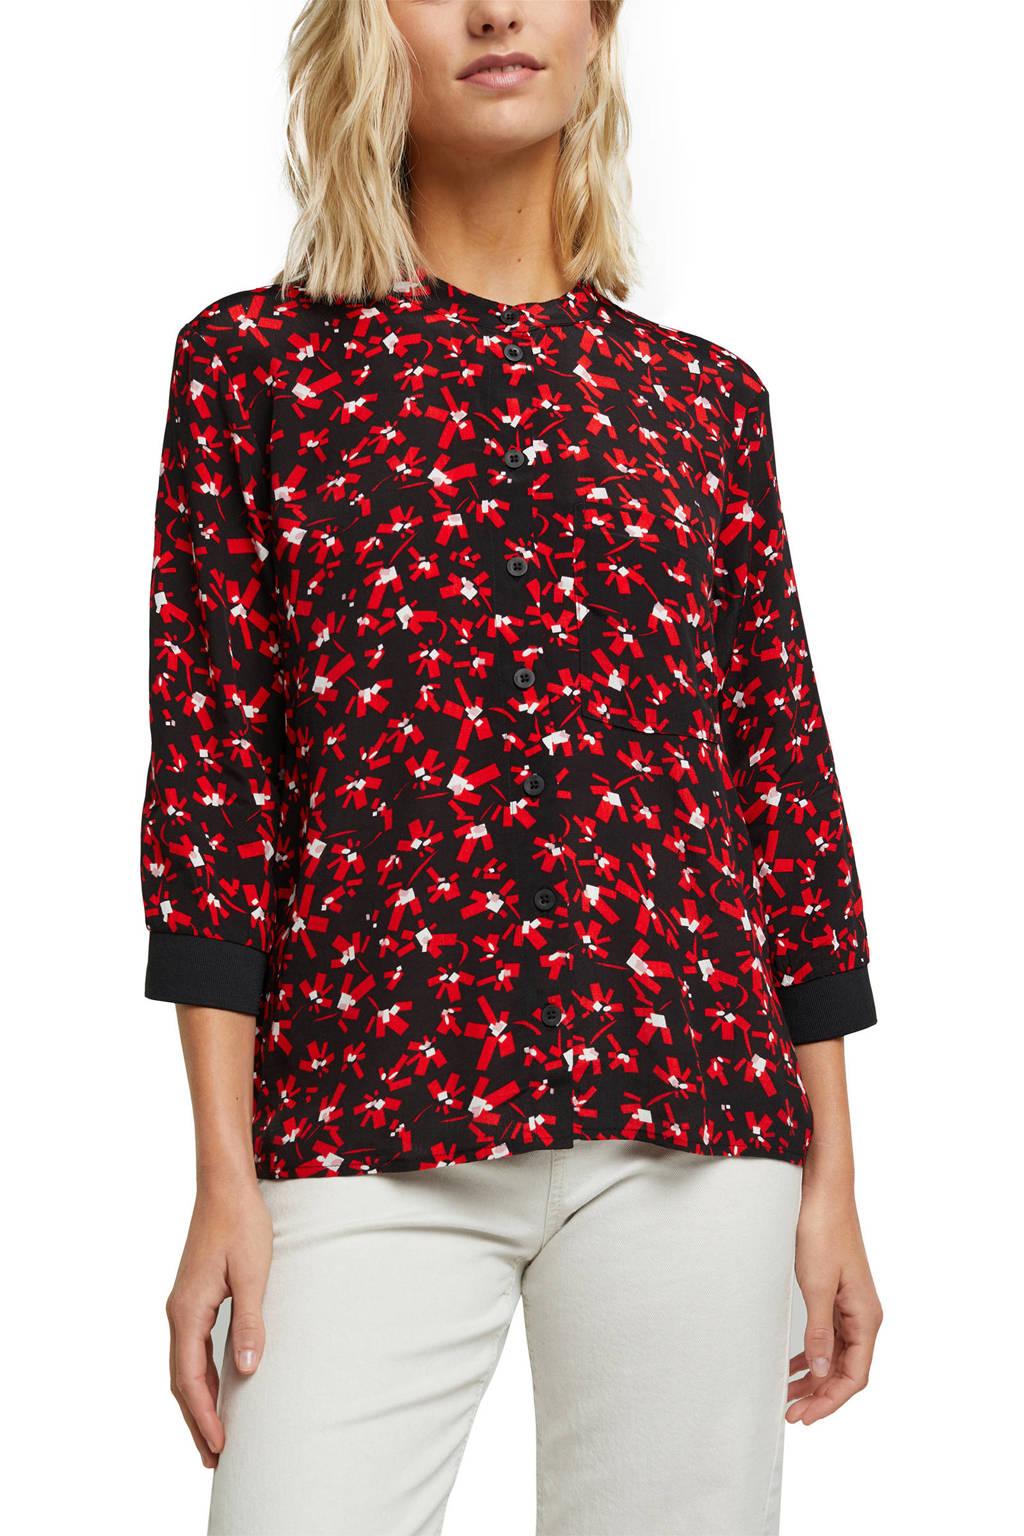 edc Women blouse met all over print zwart/rood/wit, Zwart/rood/wit